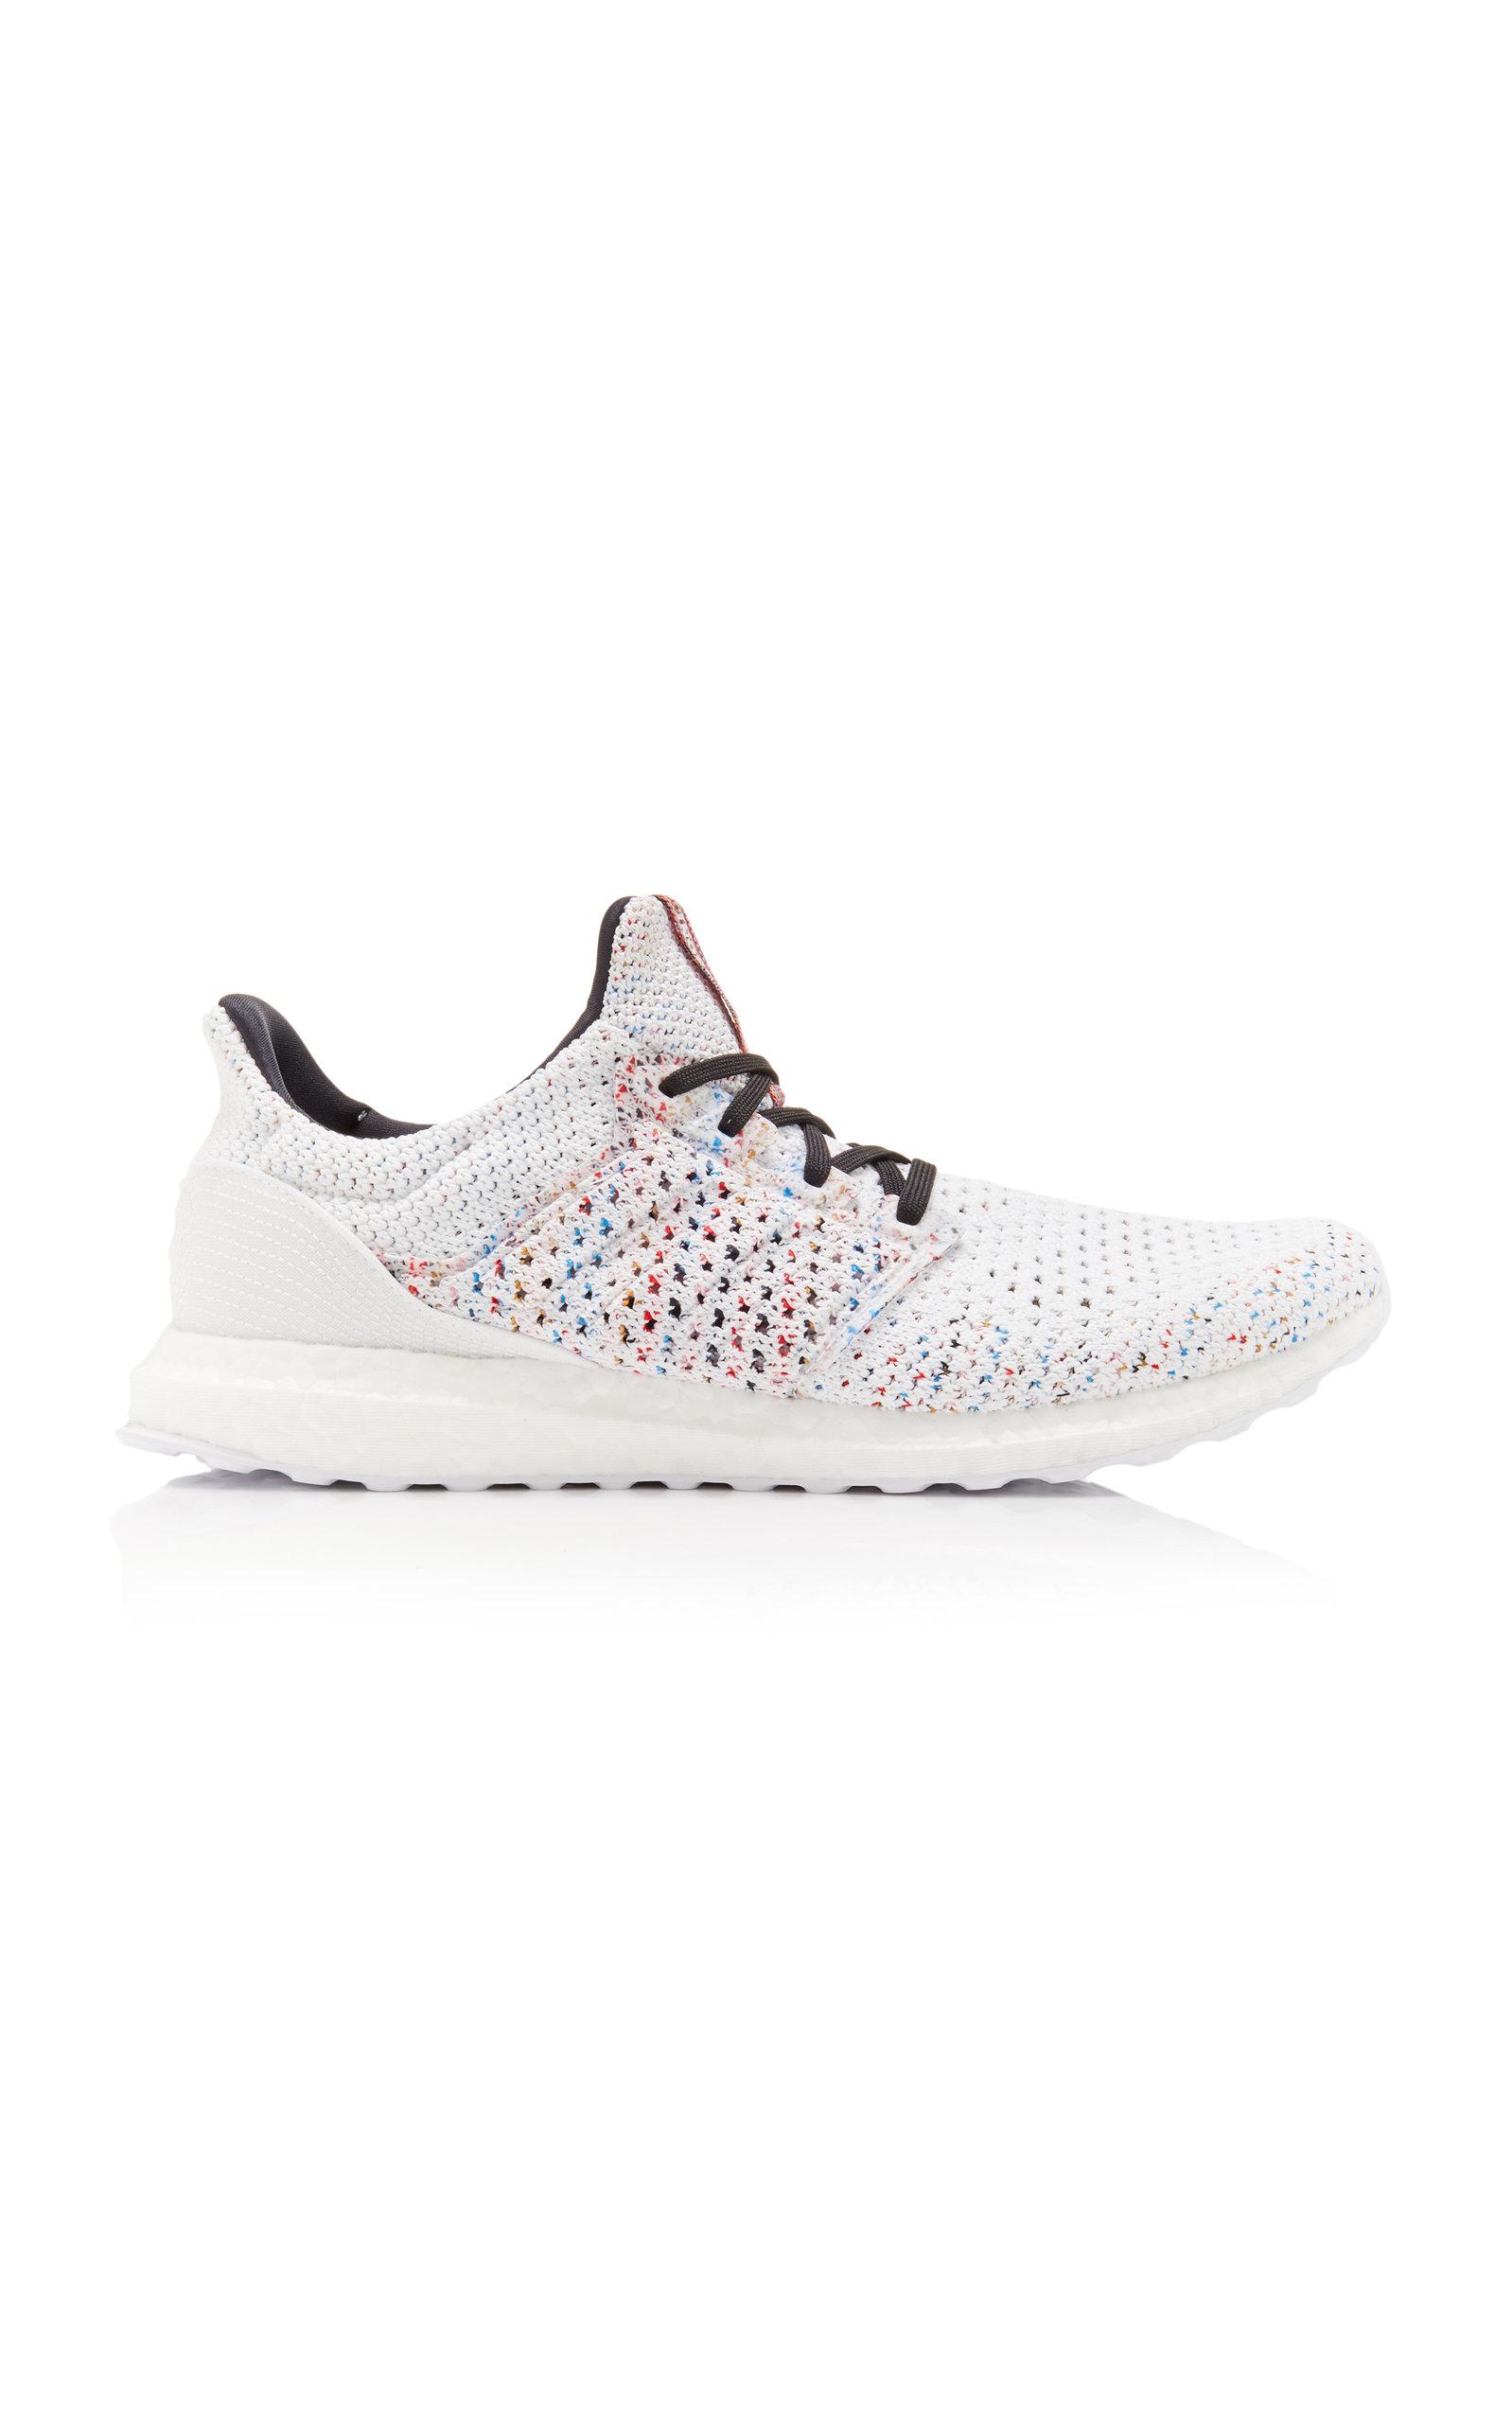 08d065e5b72f2 adidas x MissoniUltraboost Clima Knit Sneakers. CLOSE. Loading